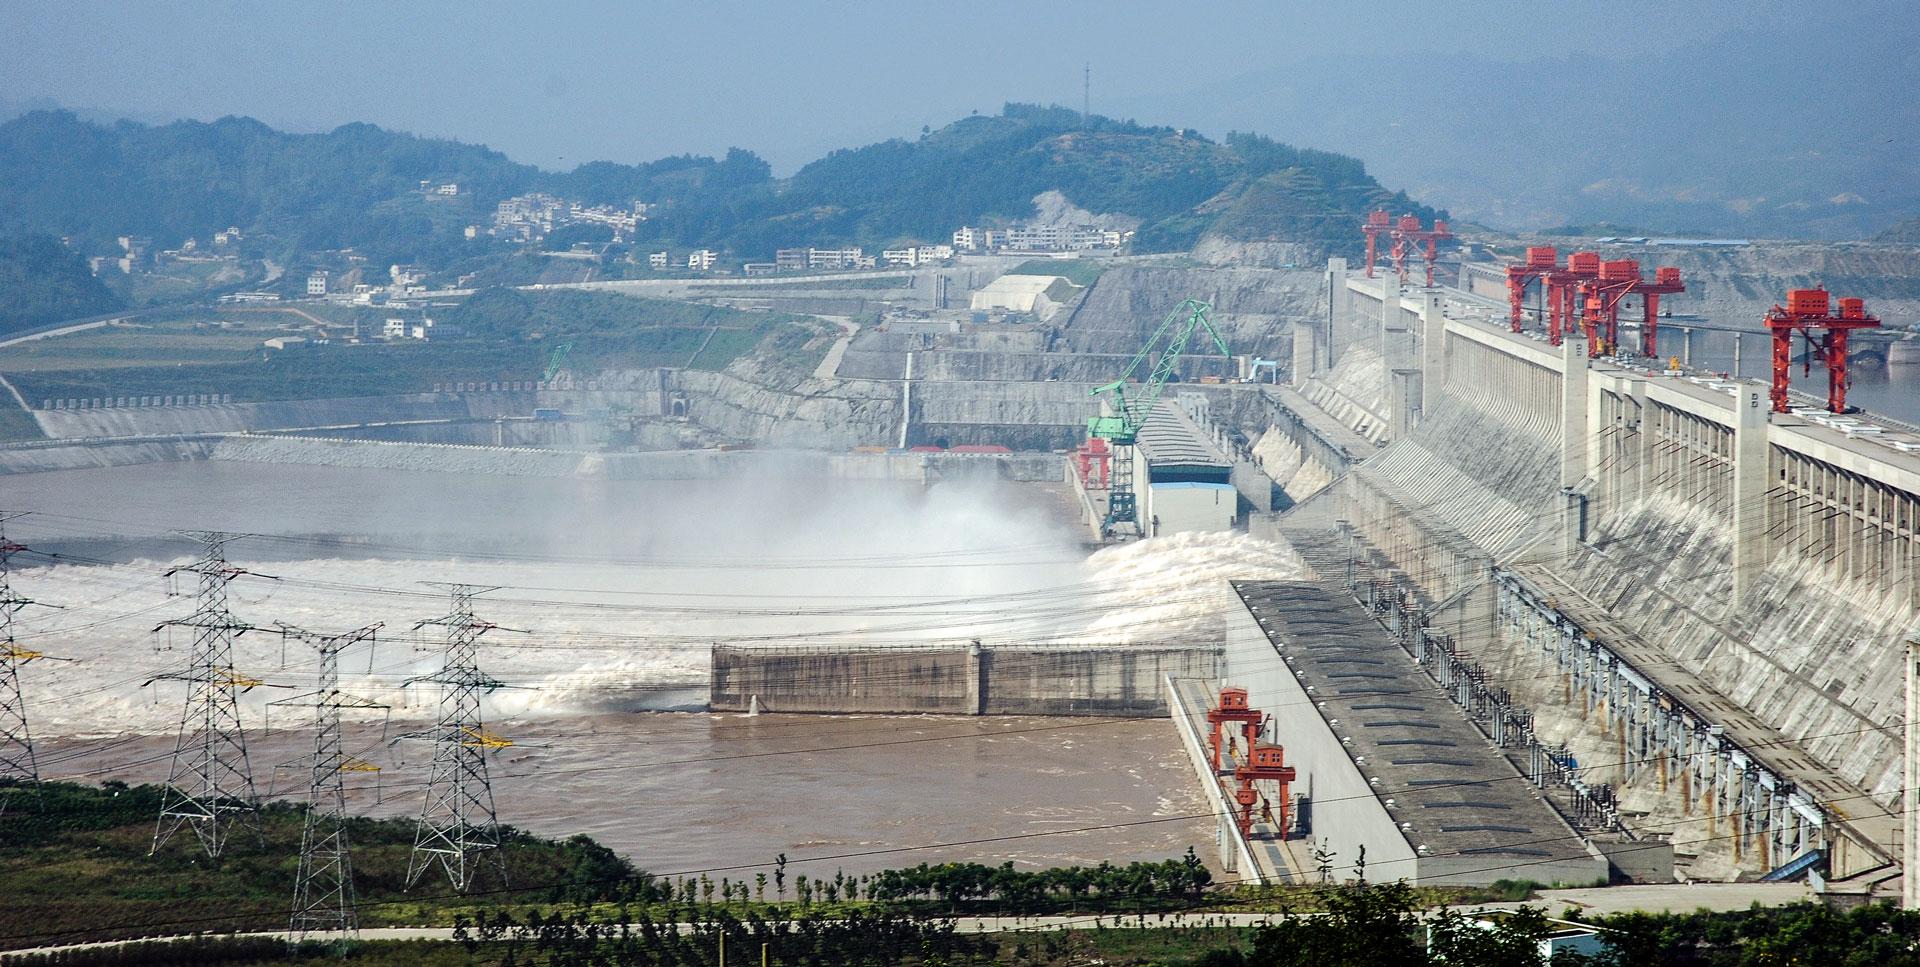 Rheotune For Three Gorges Dam Stema Systems